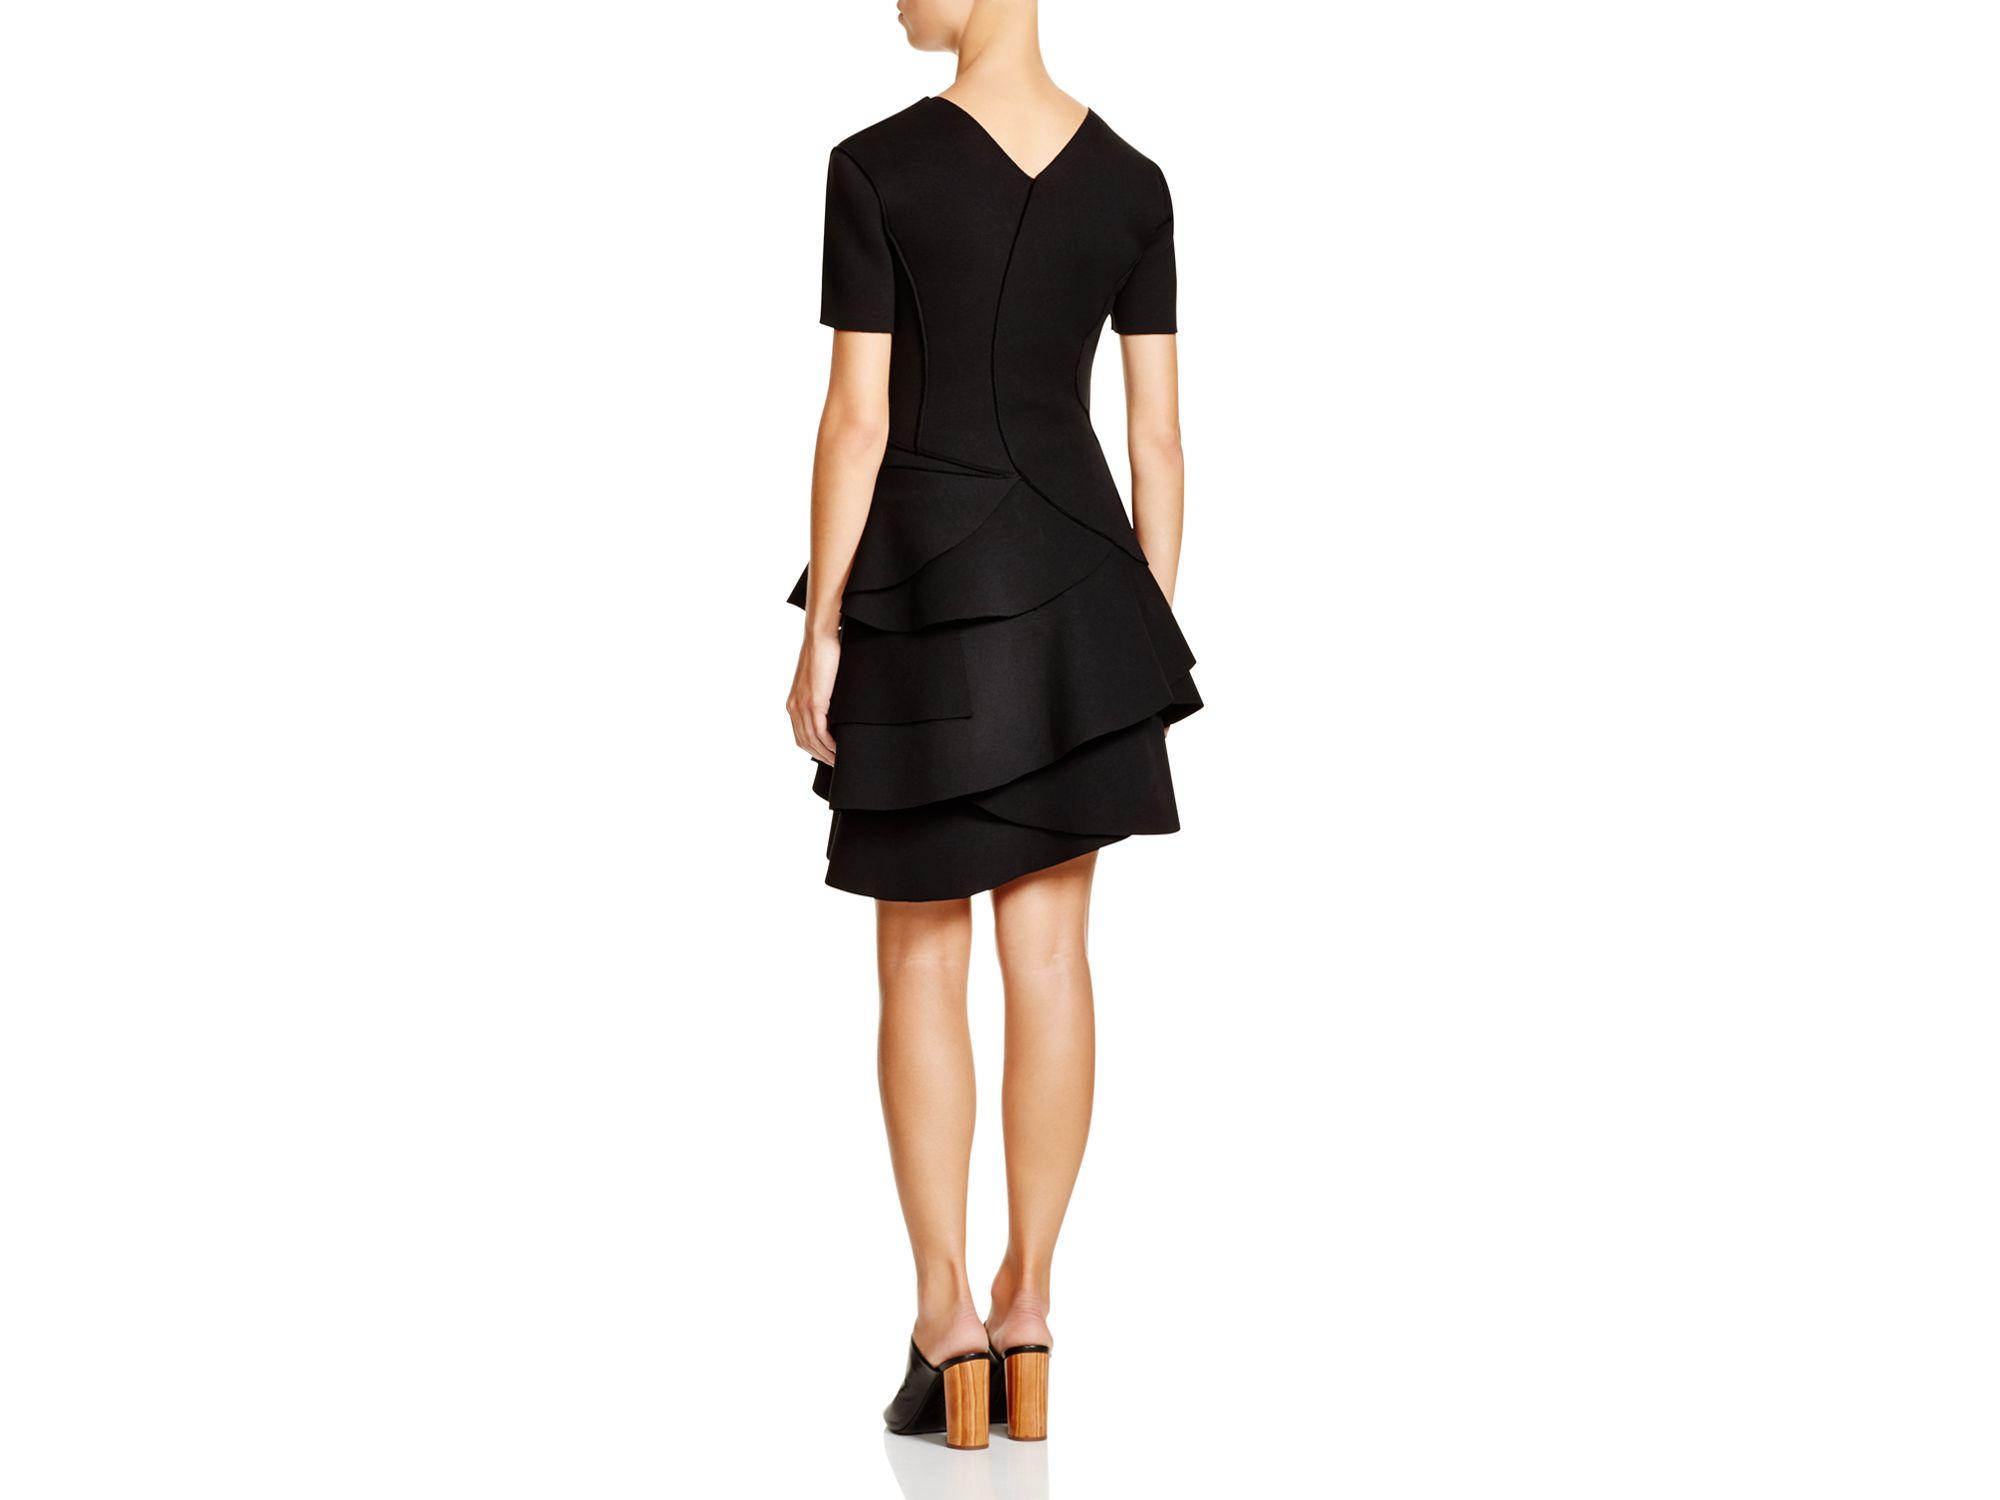 Black tiered ruffle dress